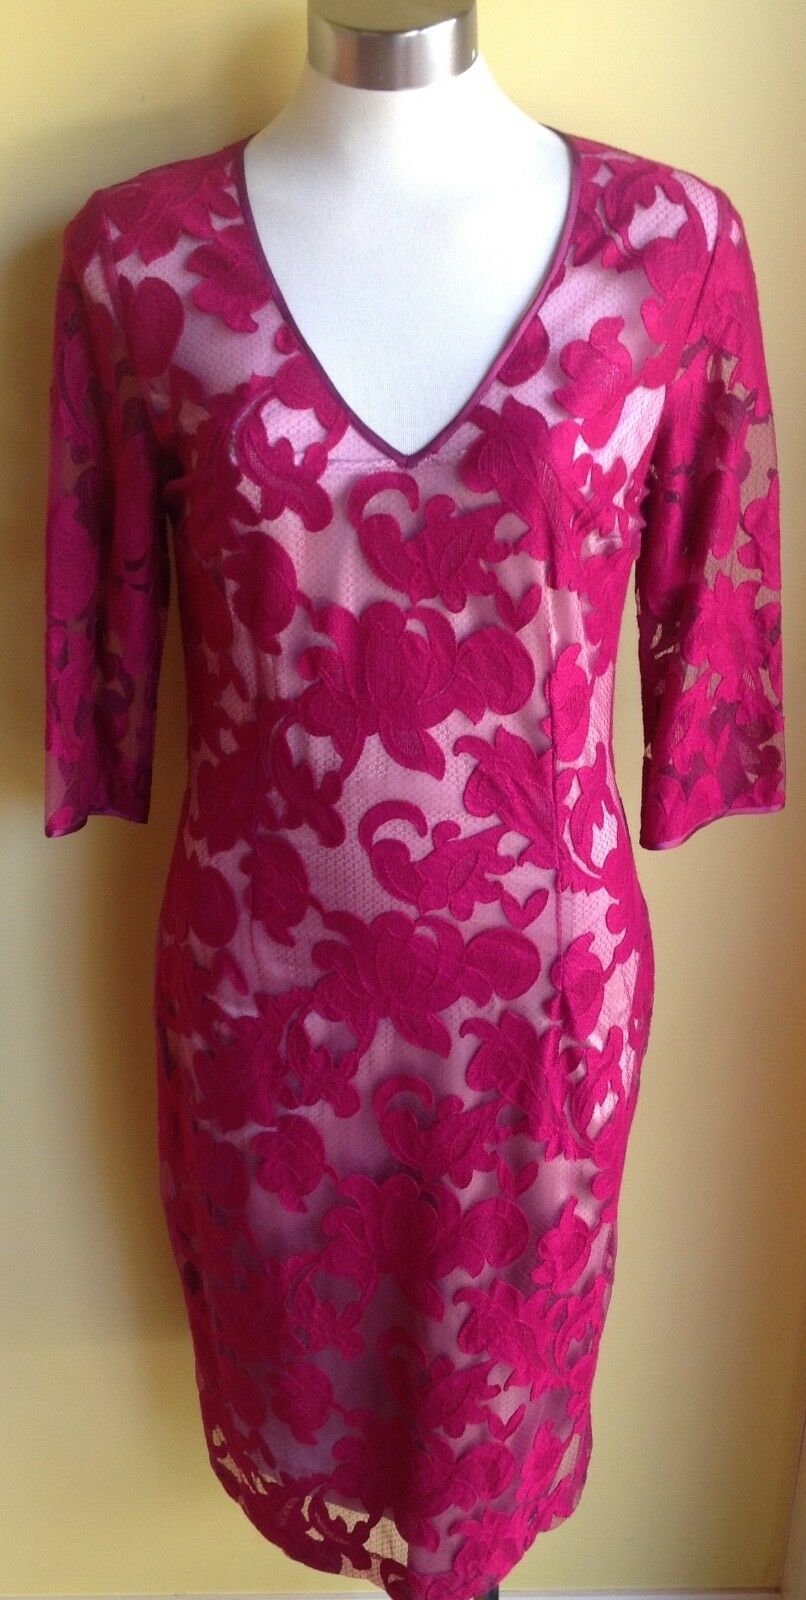 Lisa Barron Floriade Dress Size14 NWT RRP